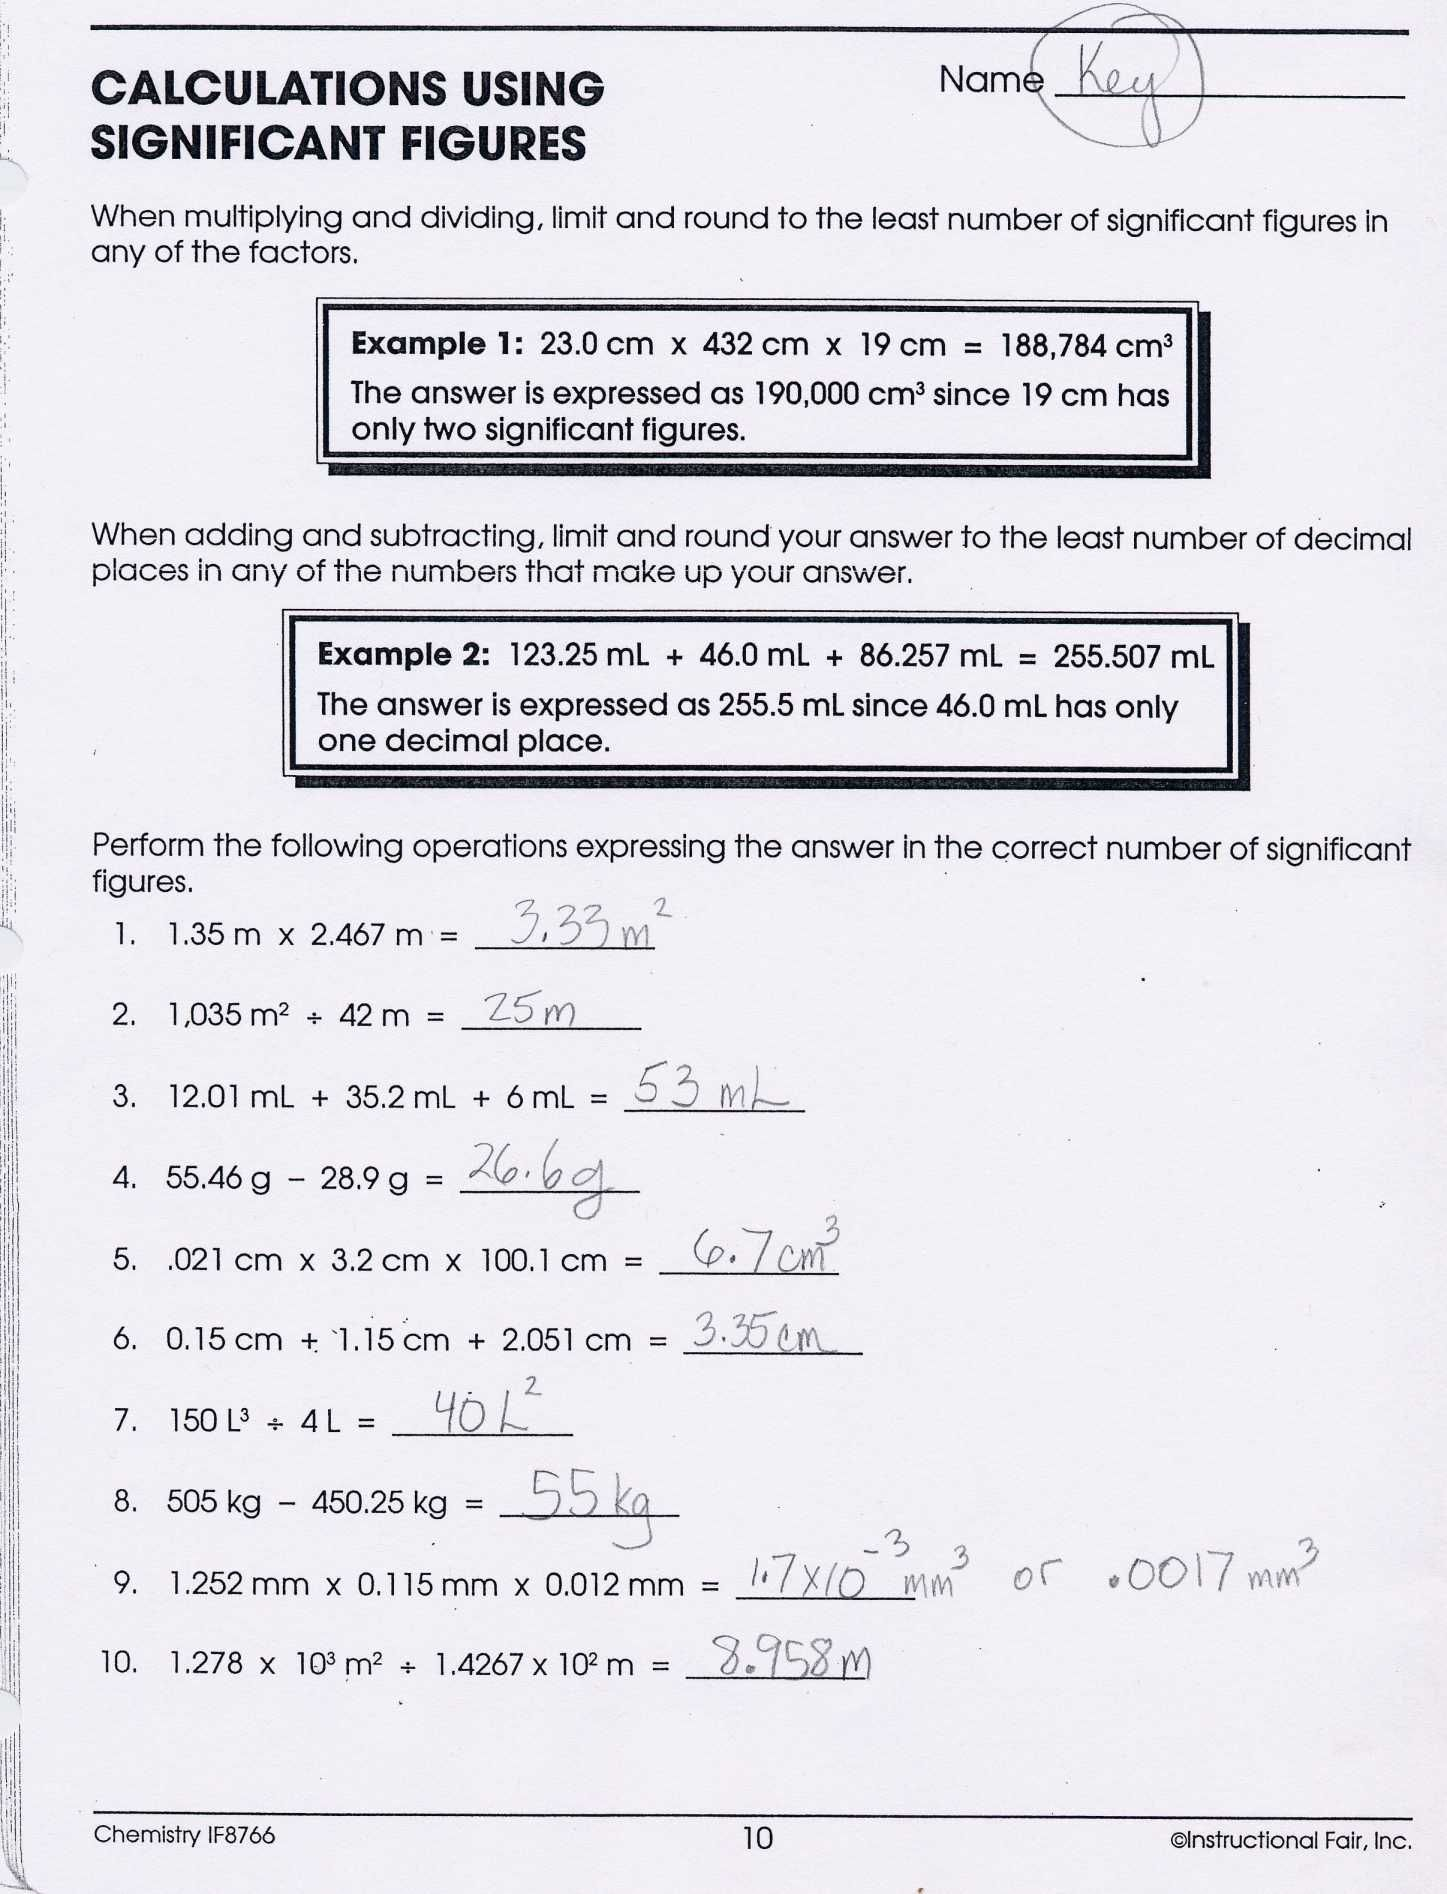 Electron Configurations Worksheet Answer Key Electron Configuration Worksheet Section 5 3 In 2021 Electron Configuration Word Problem Worksheets Worksheets Chemistry electron configuration worksheet